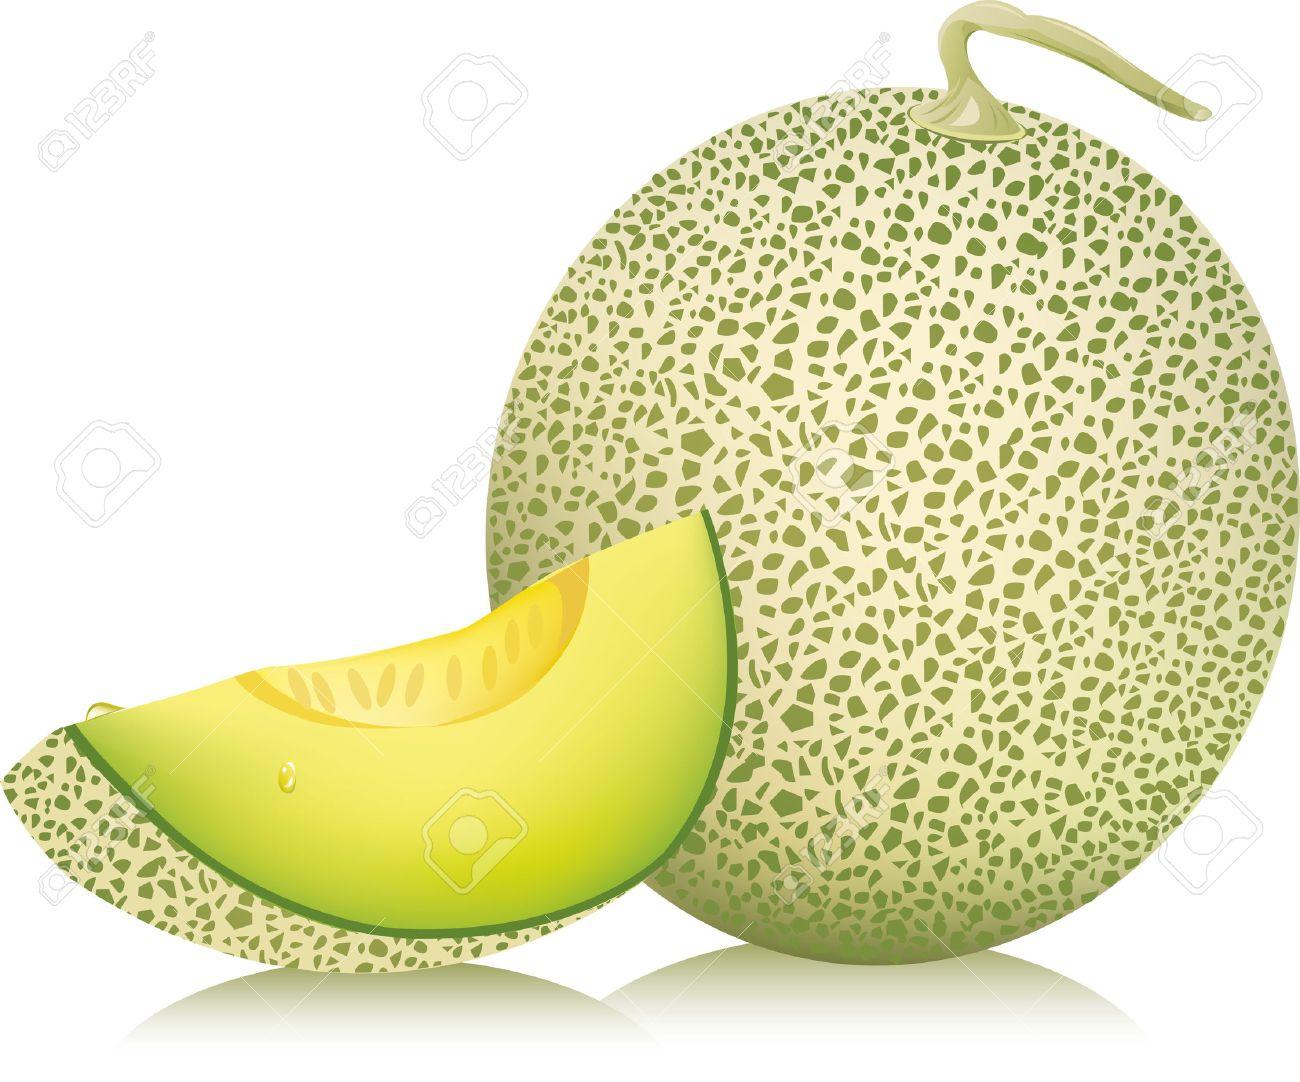 cantaloupe melon vector illustration royalty free cliparts vectors